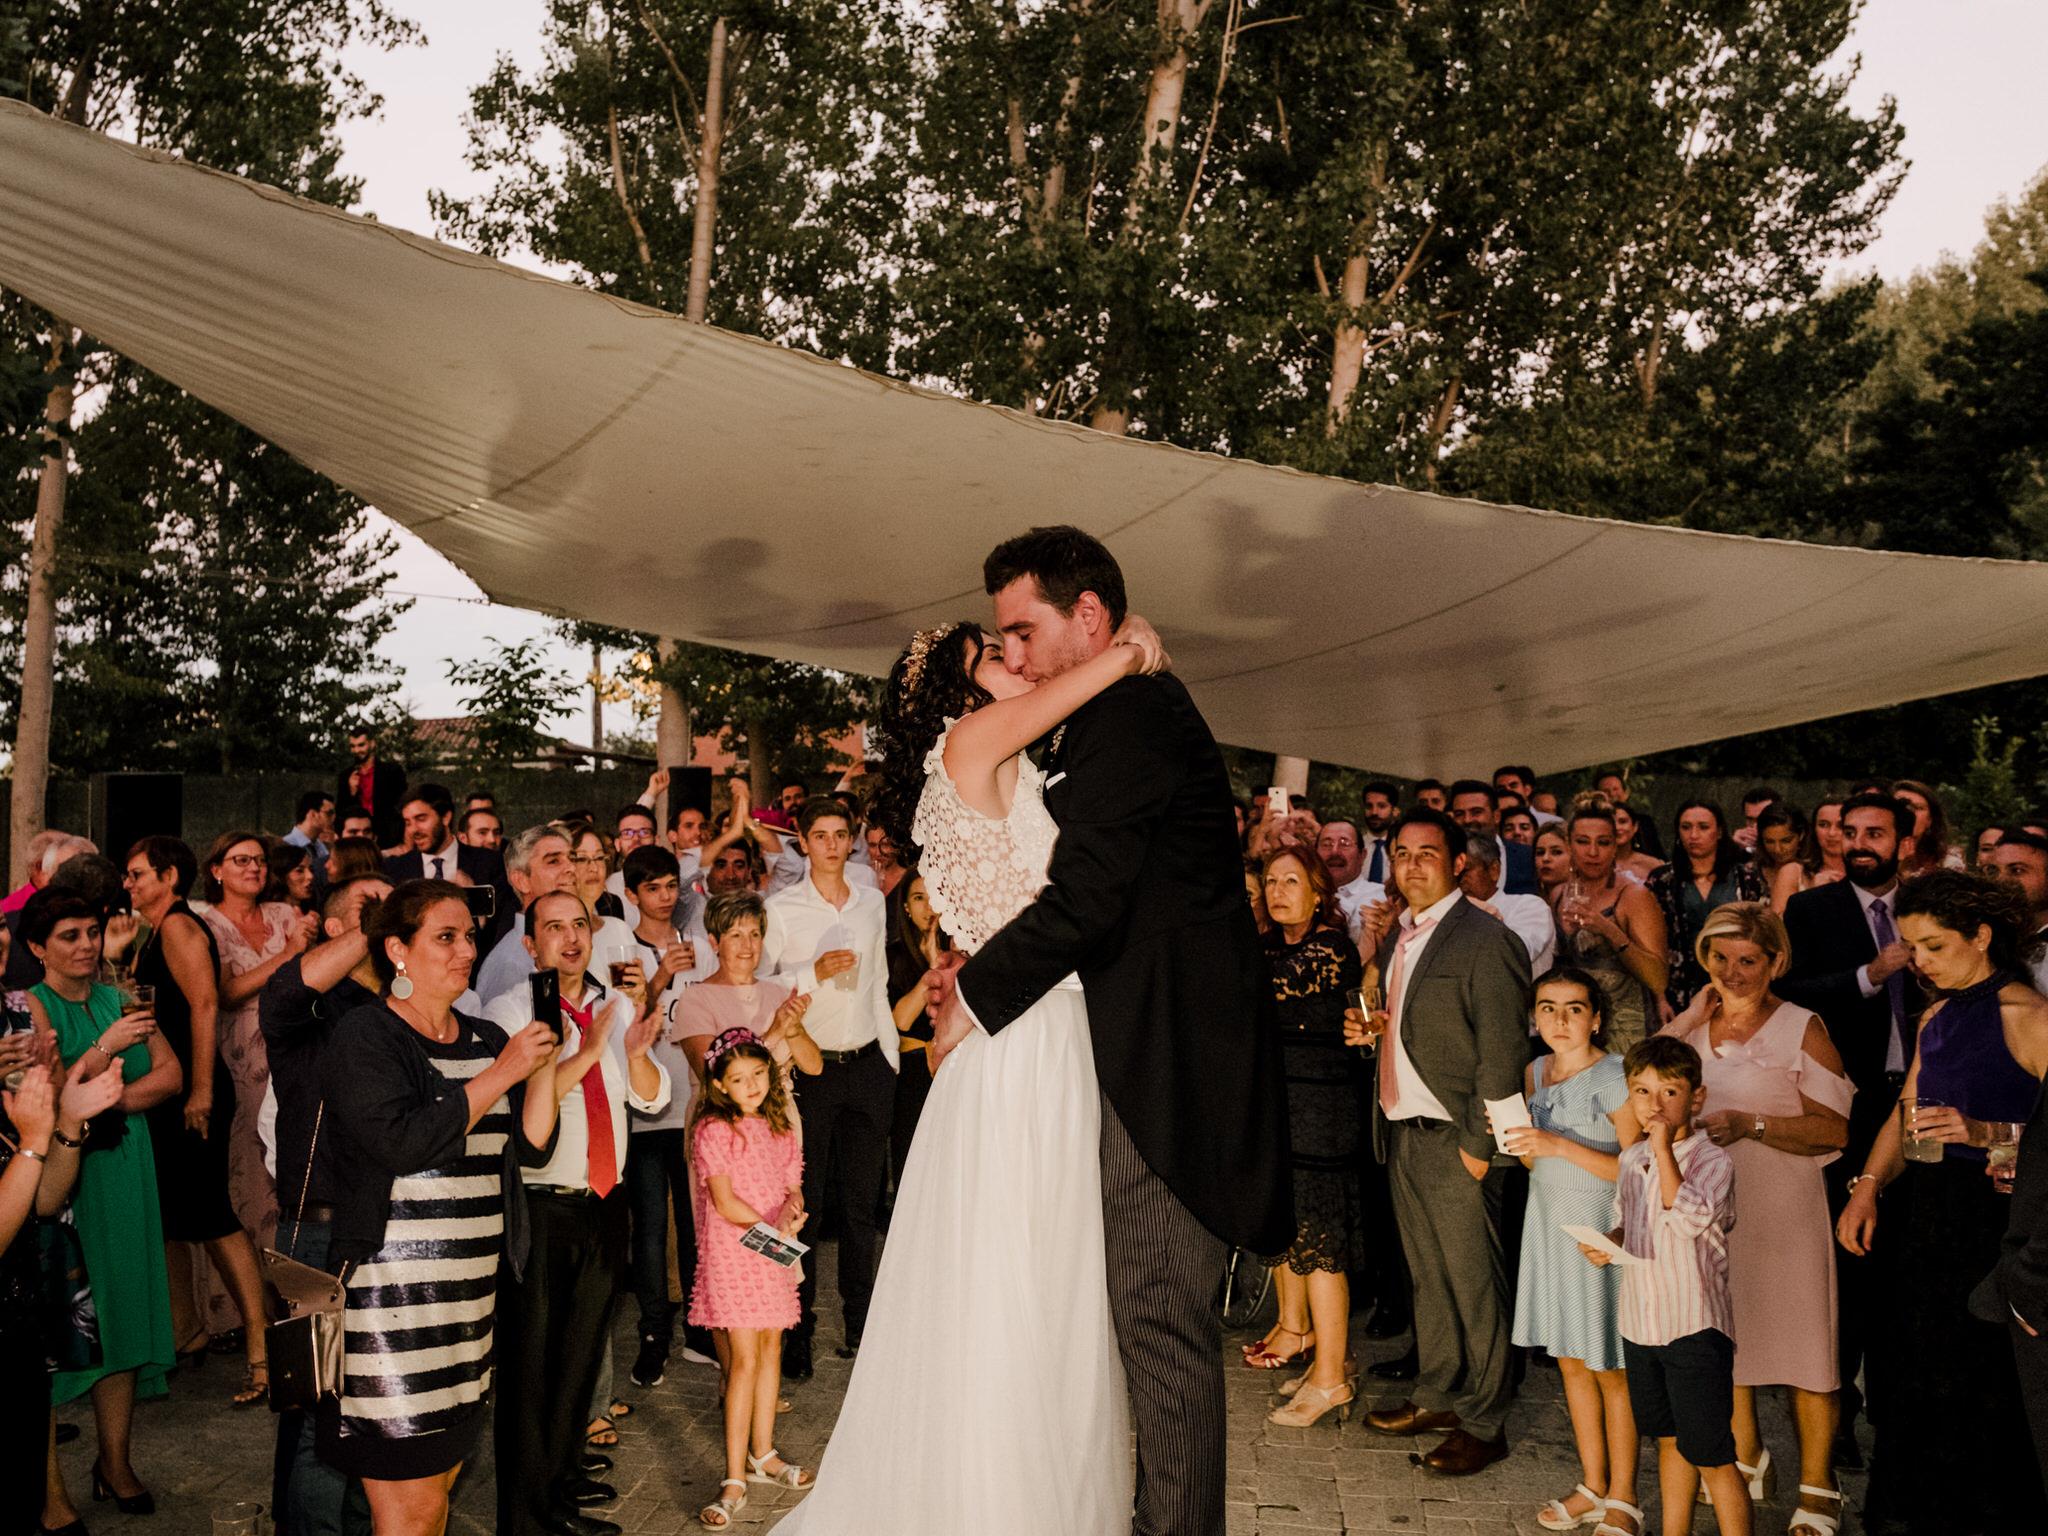 celebracion-boda-molino-torquemada